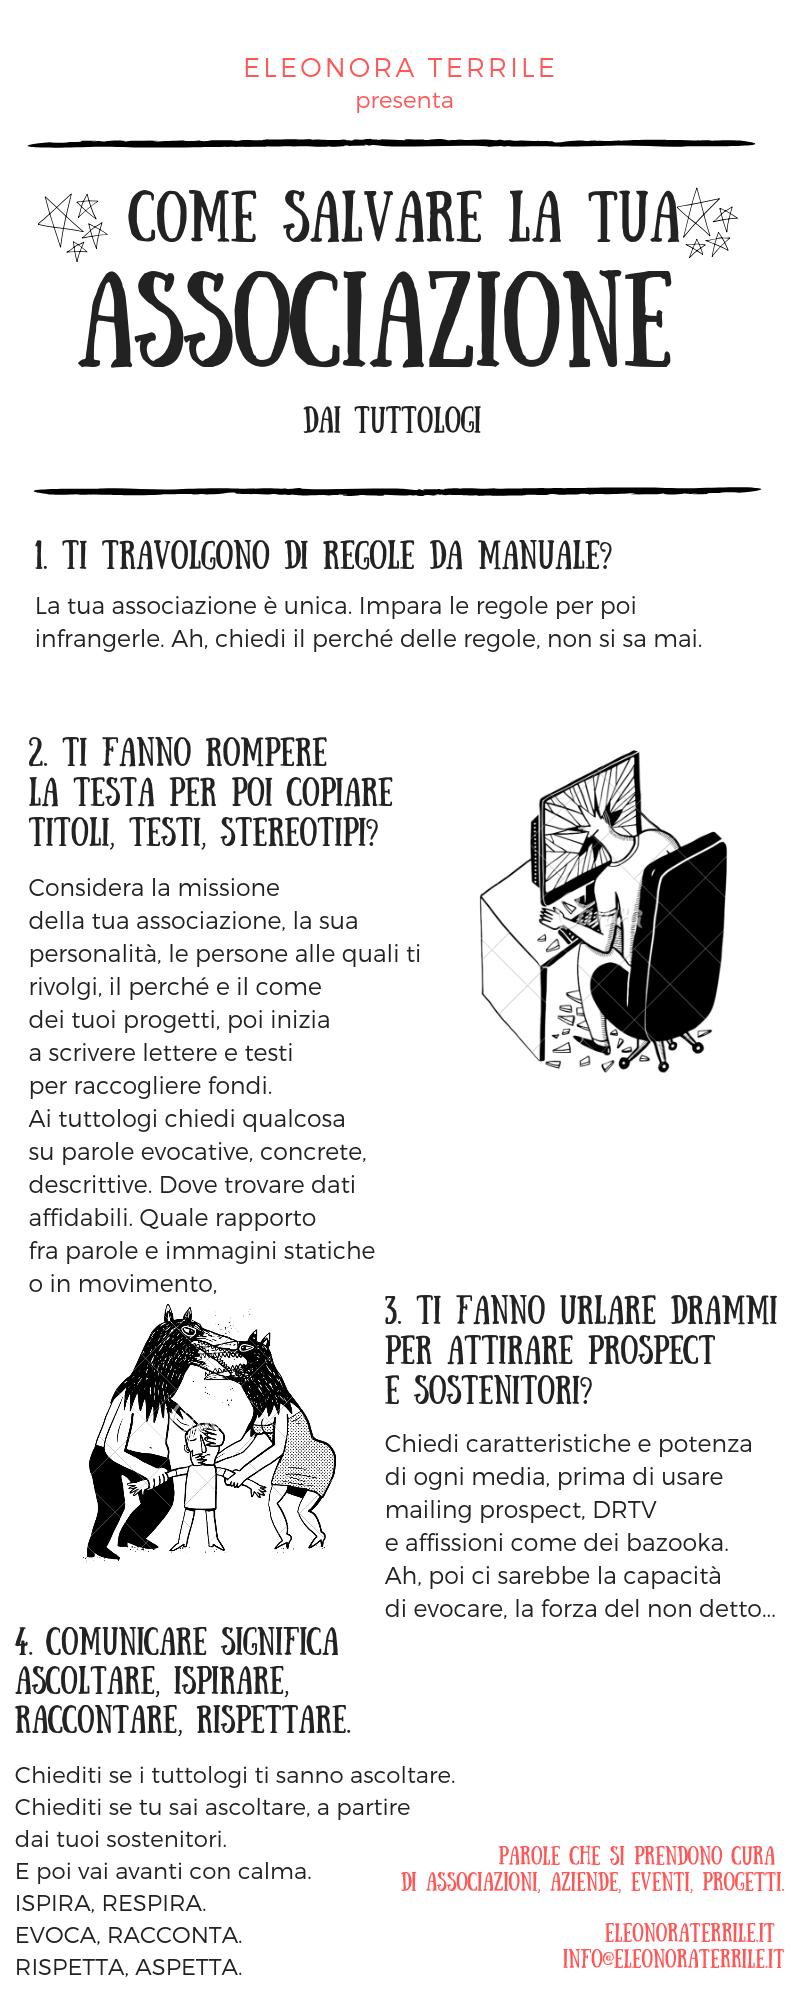 Italia: Paese di allenatori, ingegneri strutturisti, tuttologi